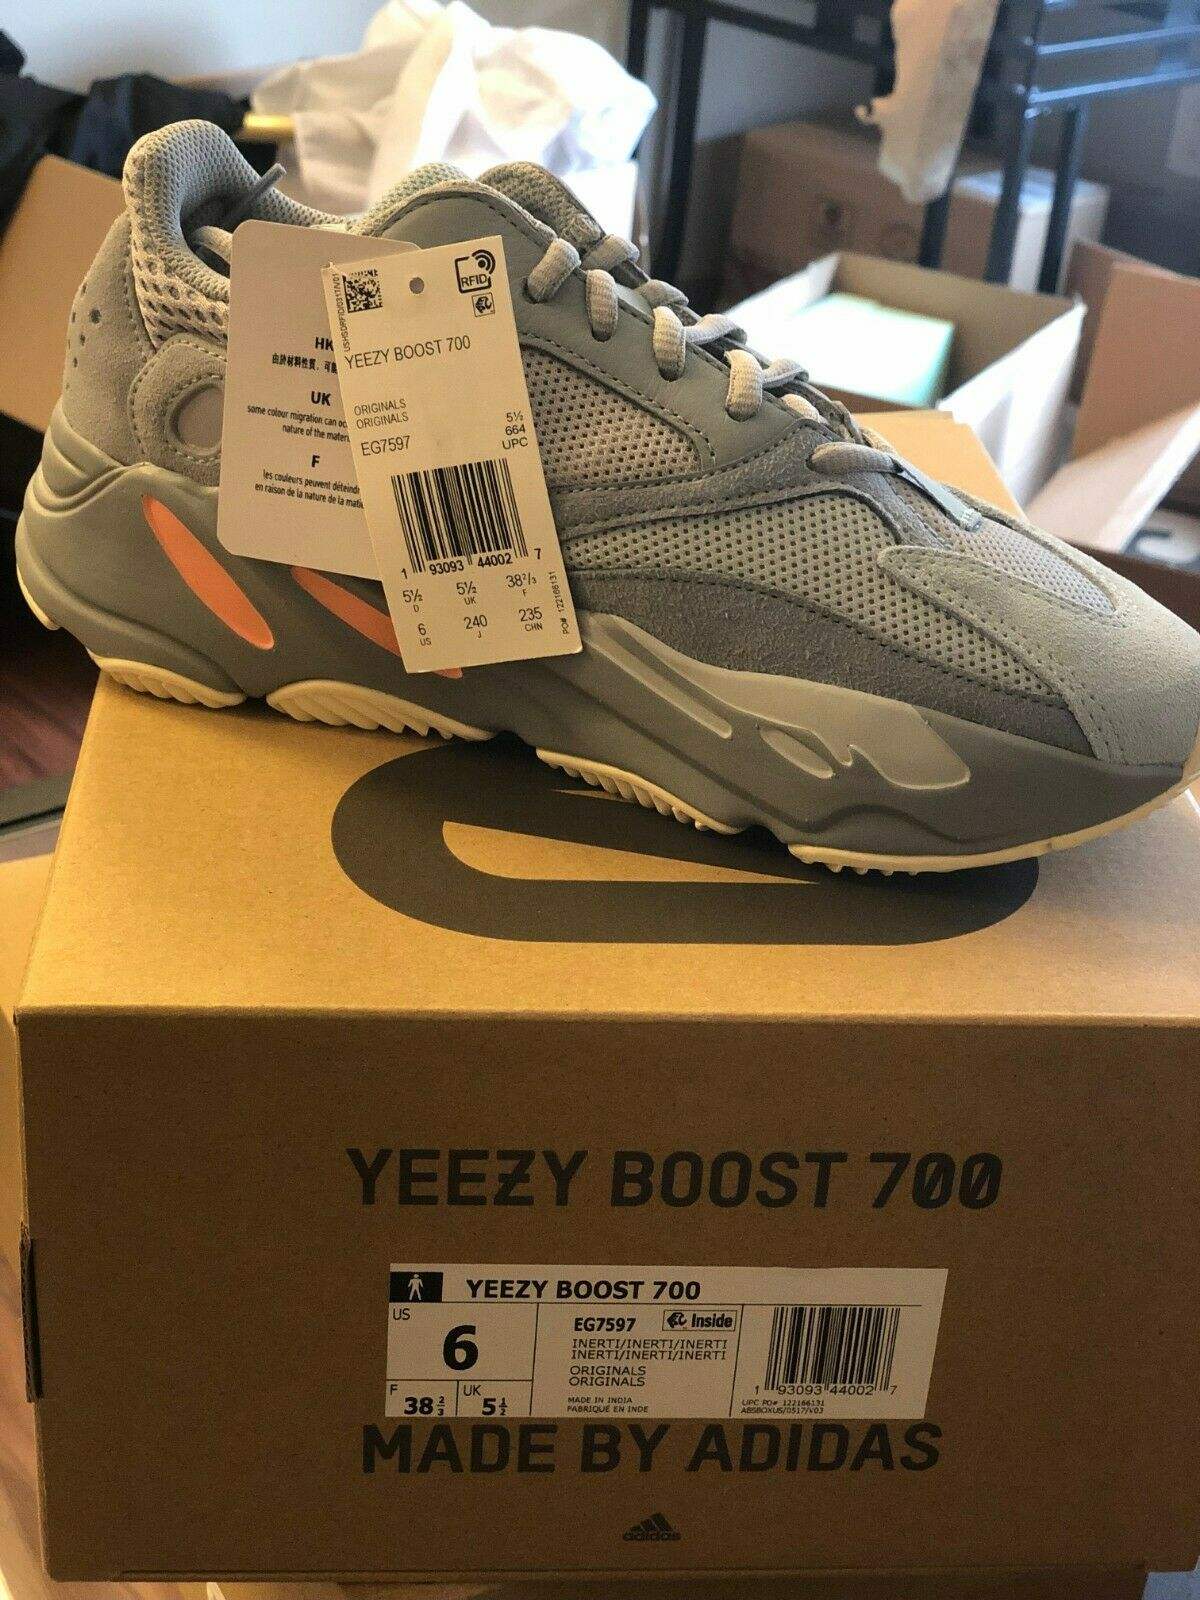 Authentic Adidas Yeezy Boost 700 Inertia Size 6 Brand New